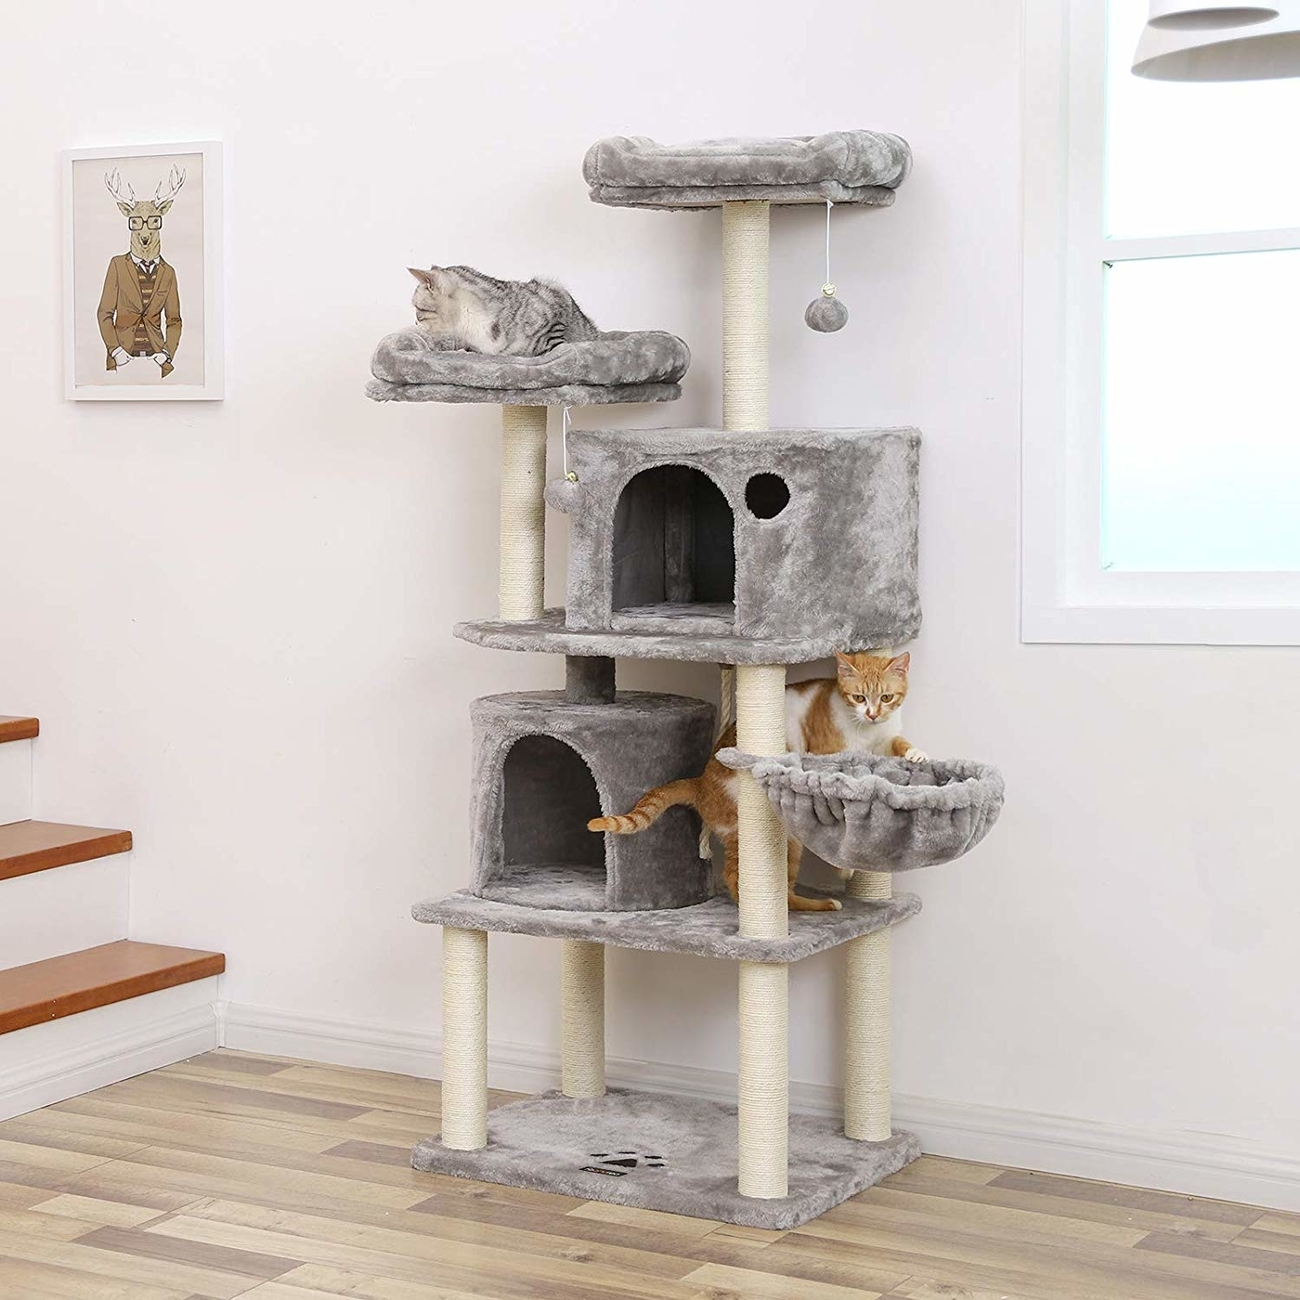 FEANDREA Katzen Kratzbaum mit 2 Höhlen, Bild 17